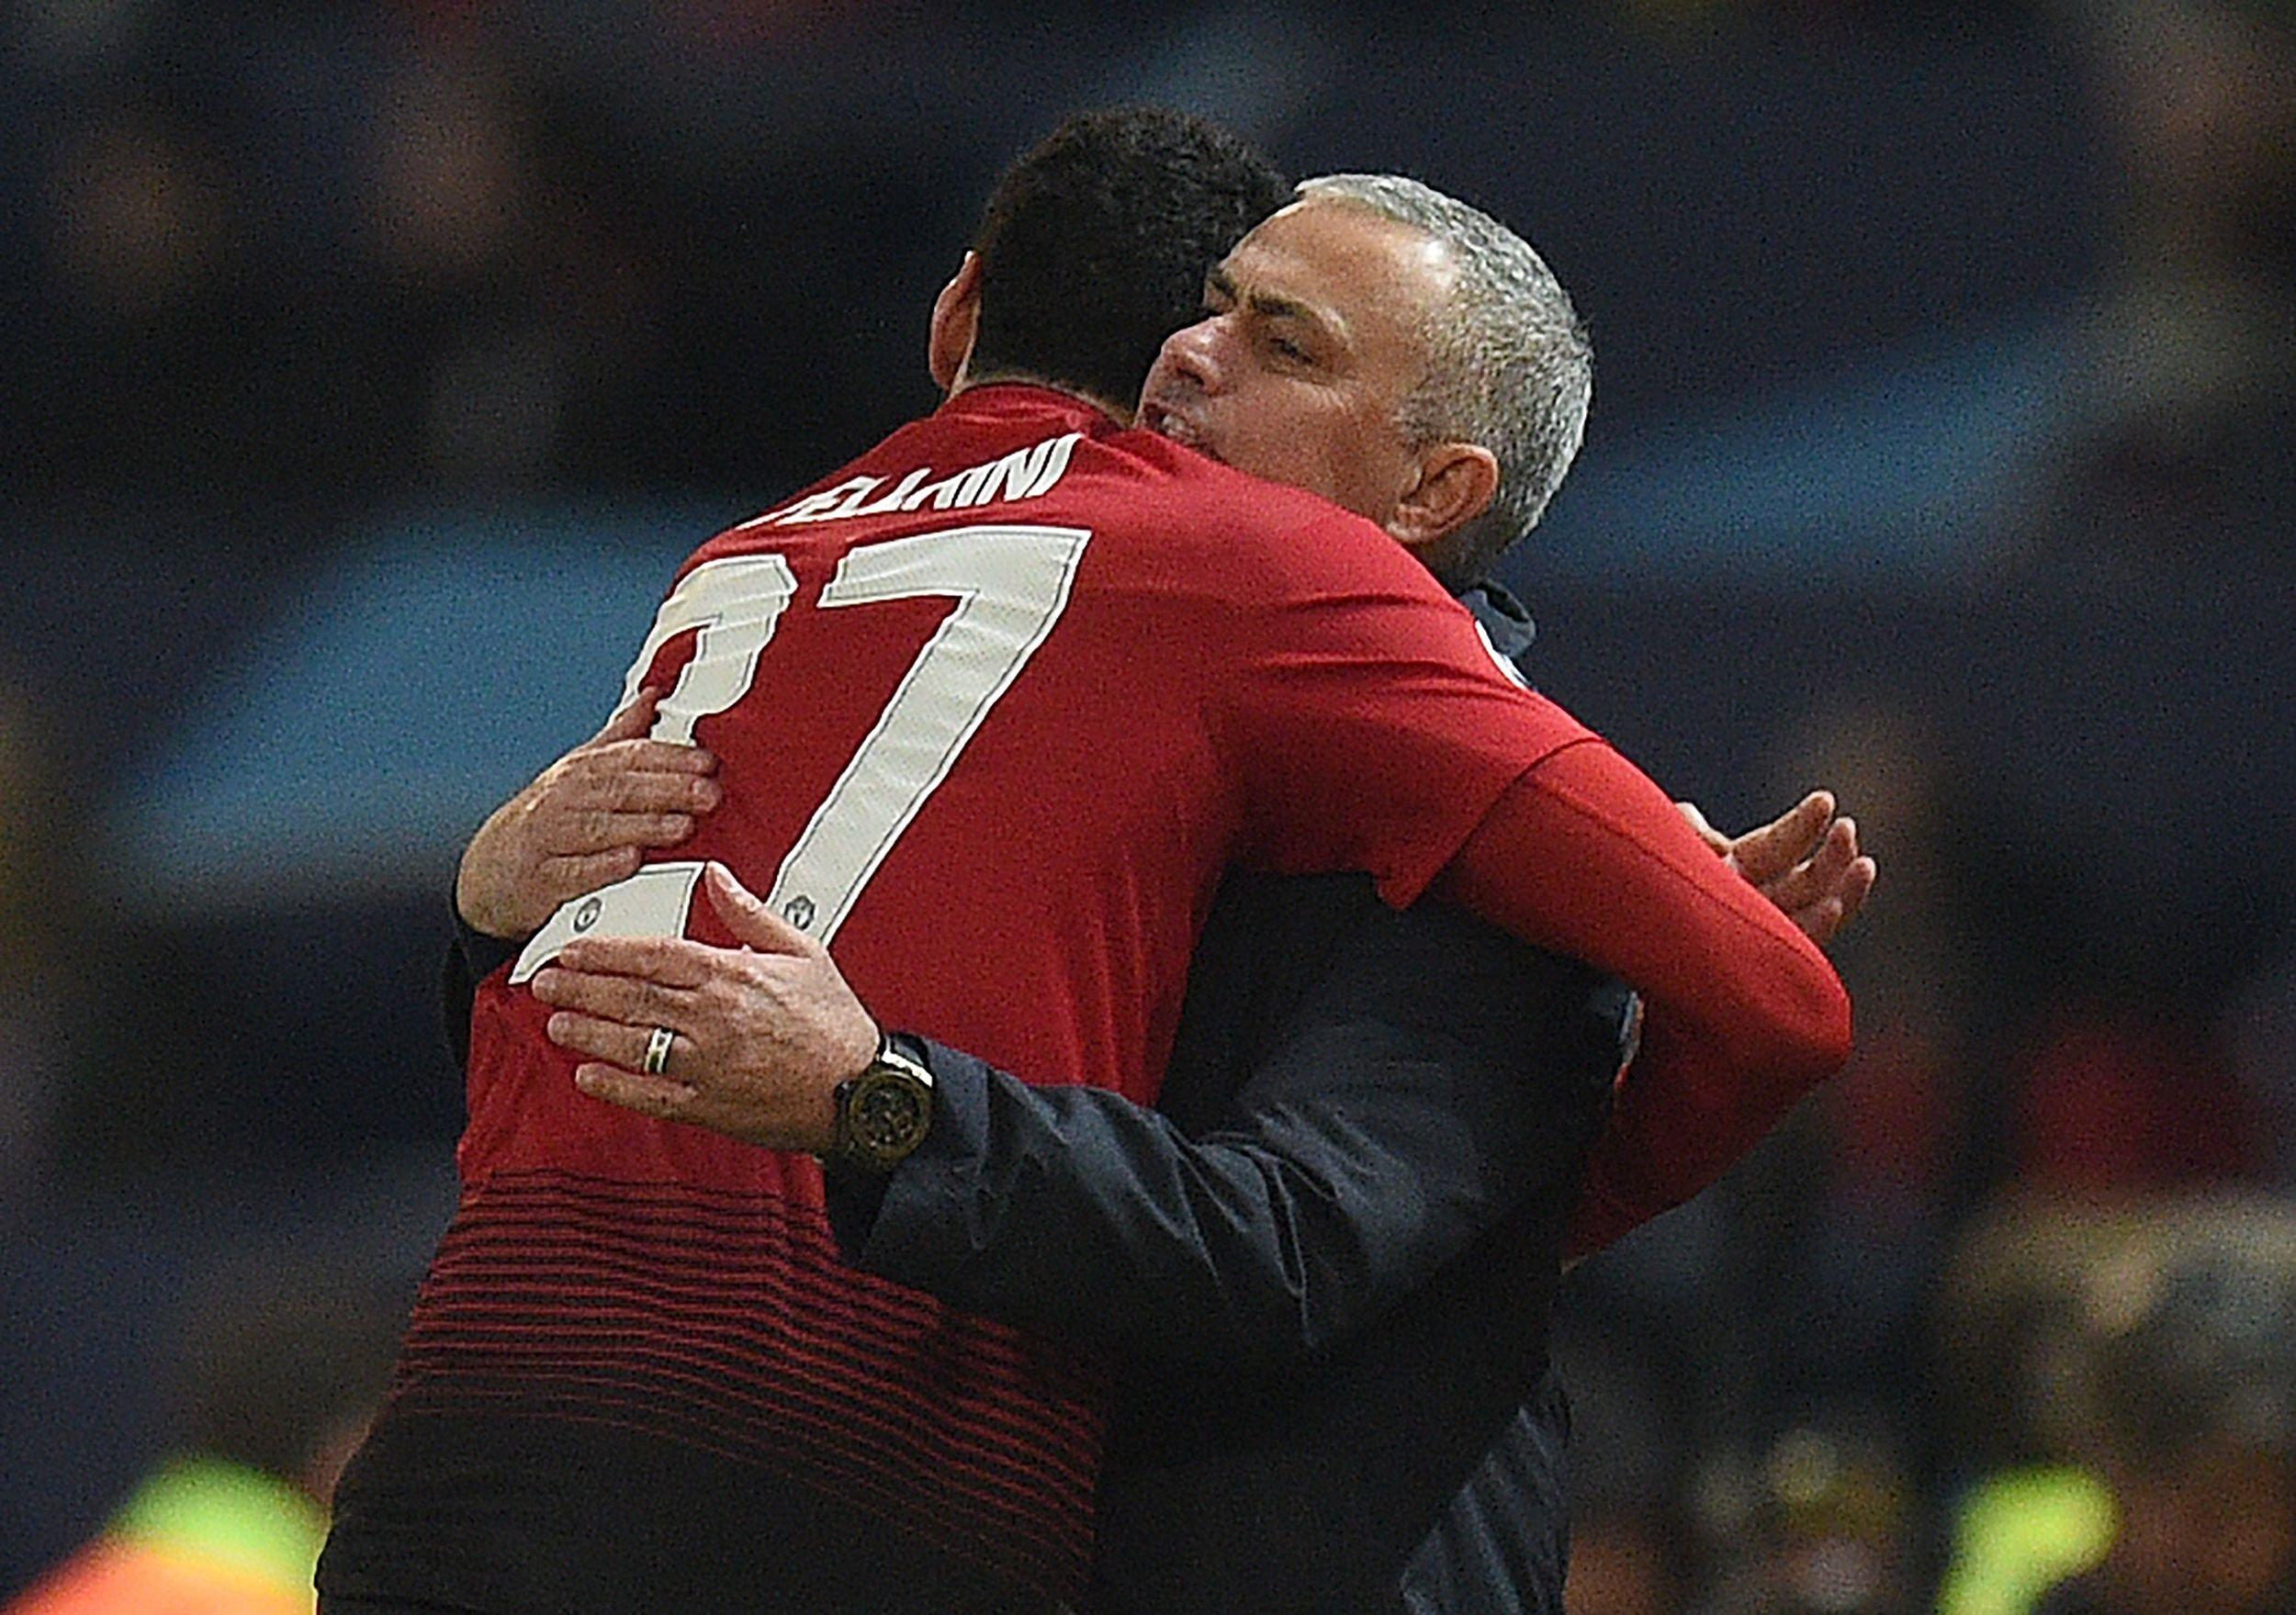 Jose Mourinho heaps praise on Marouane Fellaini and names his best position